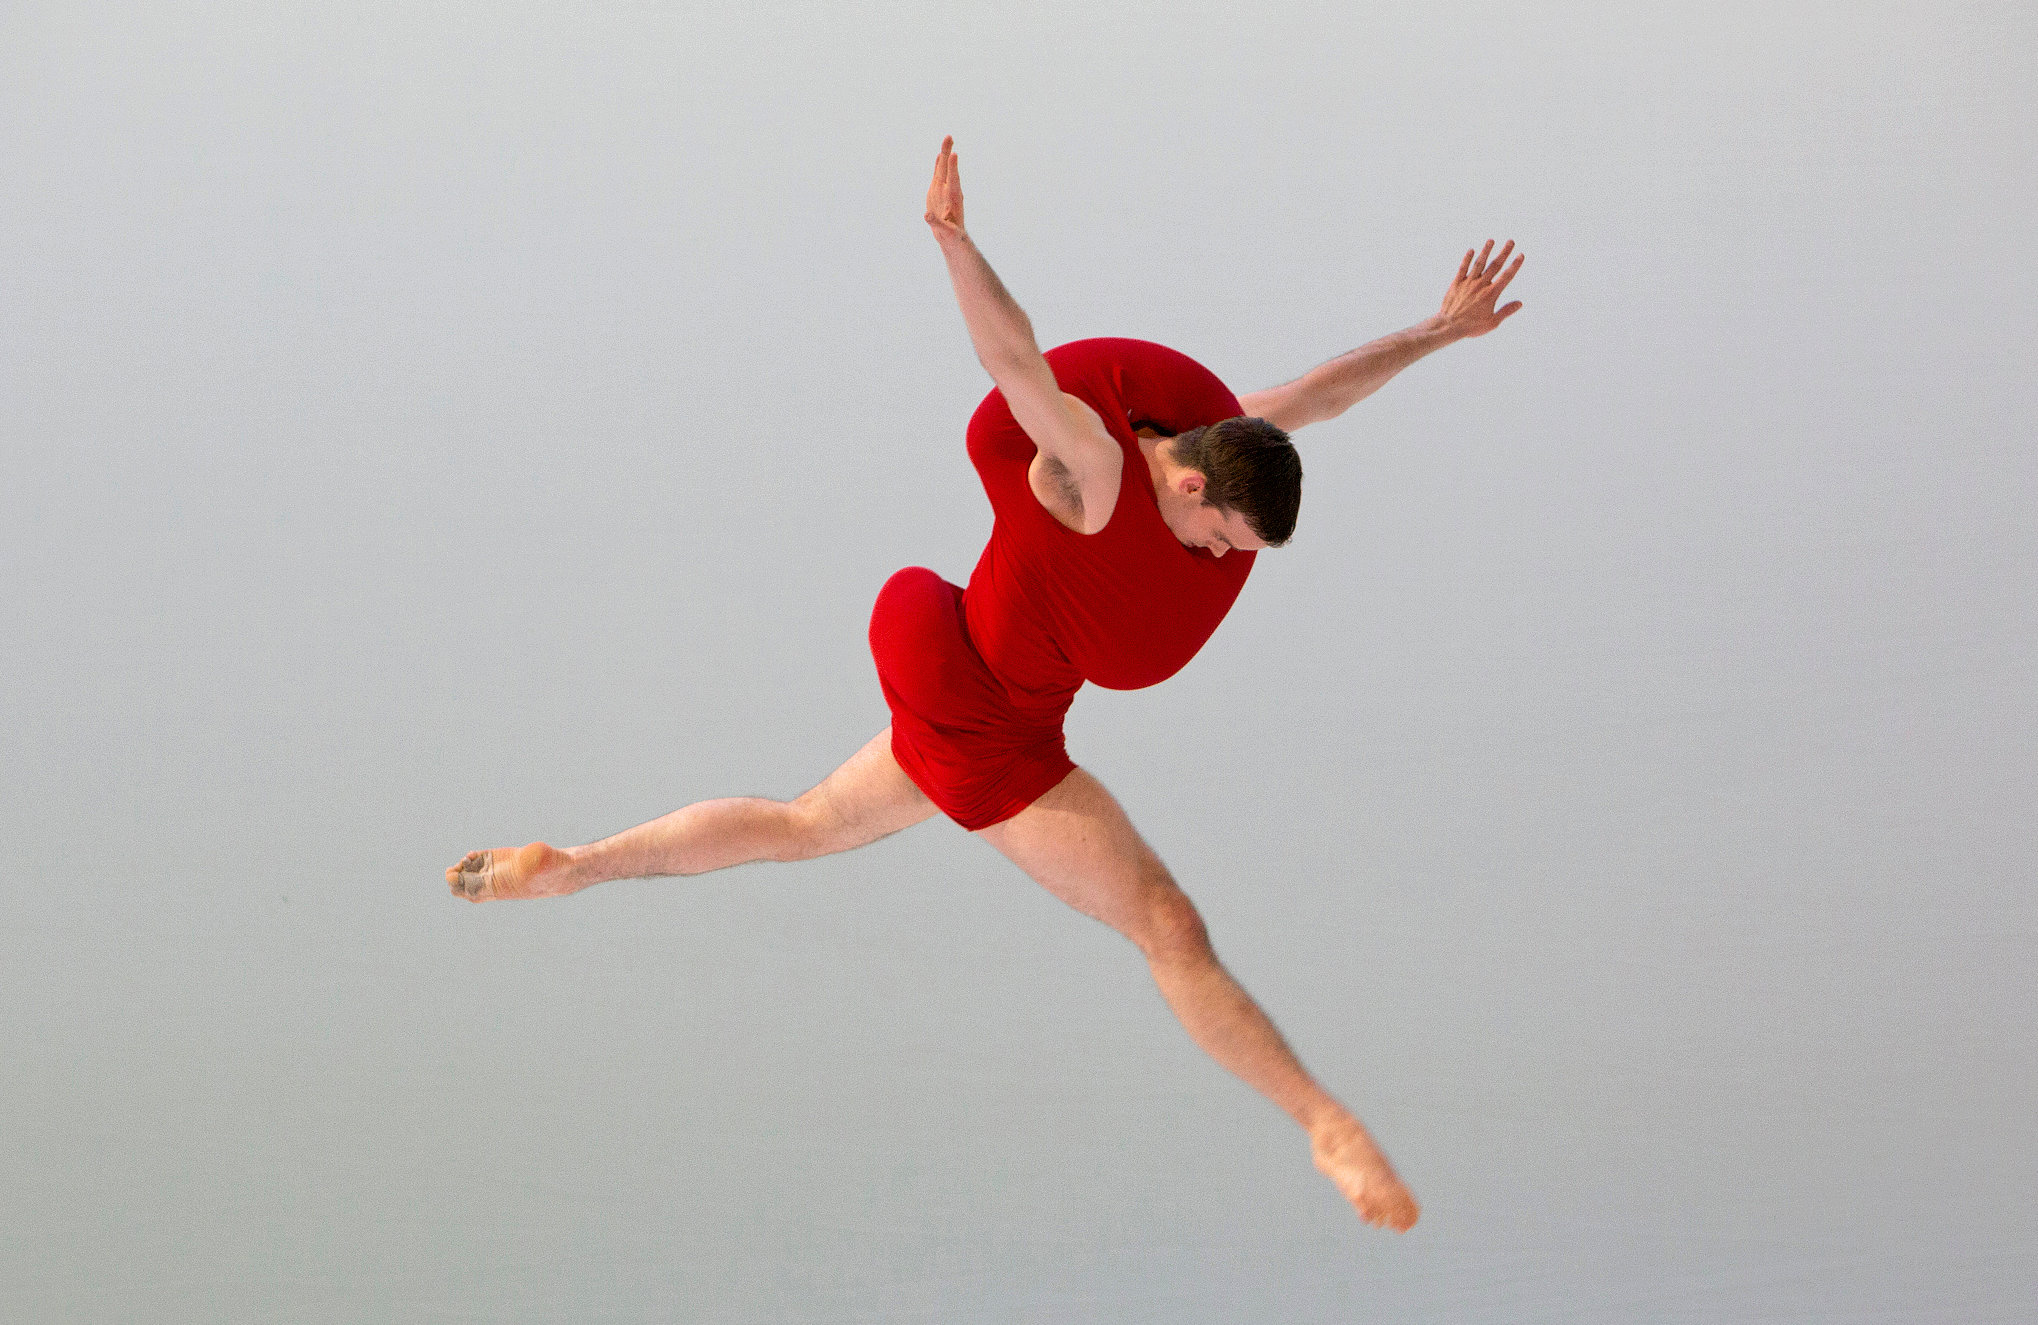 Folie-A-Plusieurs-Parfums-Merce-Cunningham-Dance-Movement-Fragrance